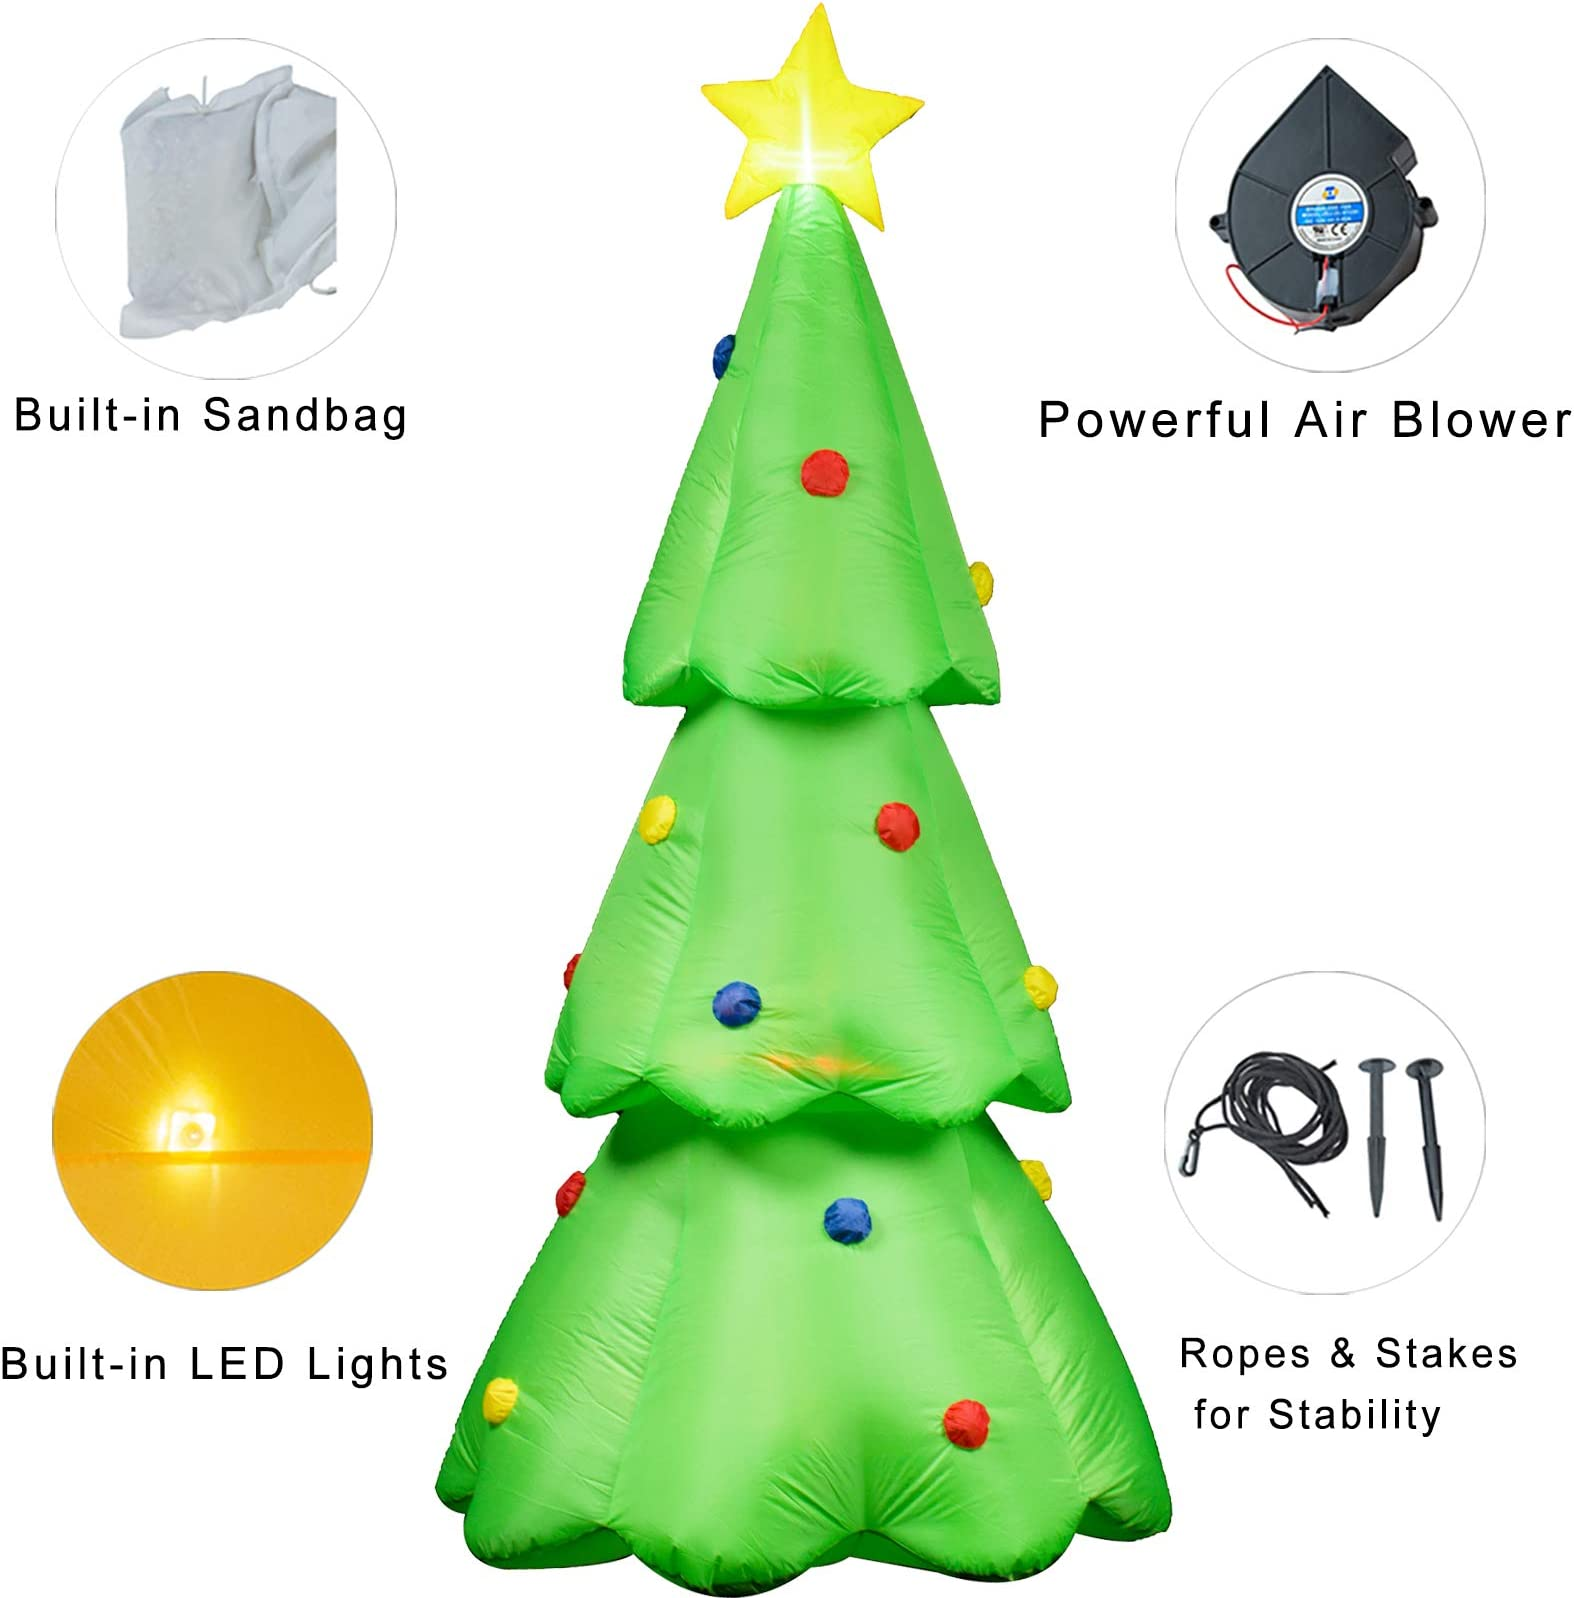 Lighted Christmas Tree Yard Decorations  from m.media-amazon.com